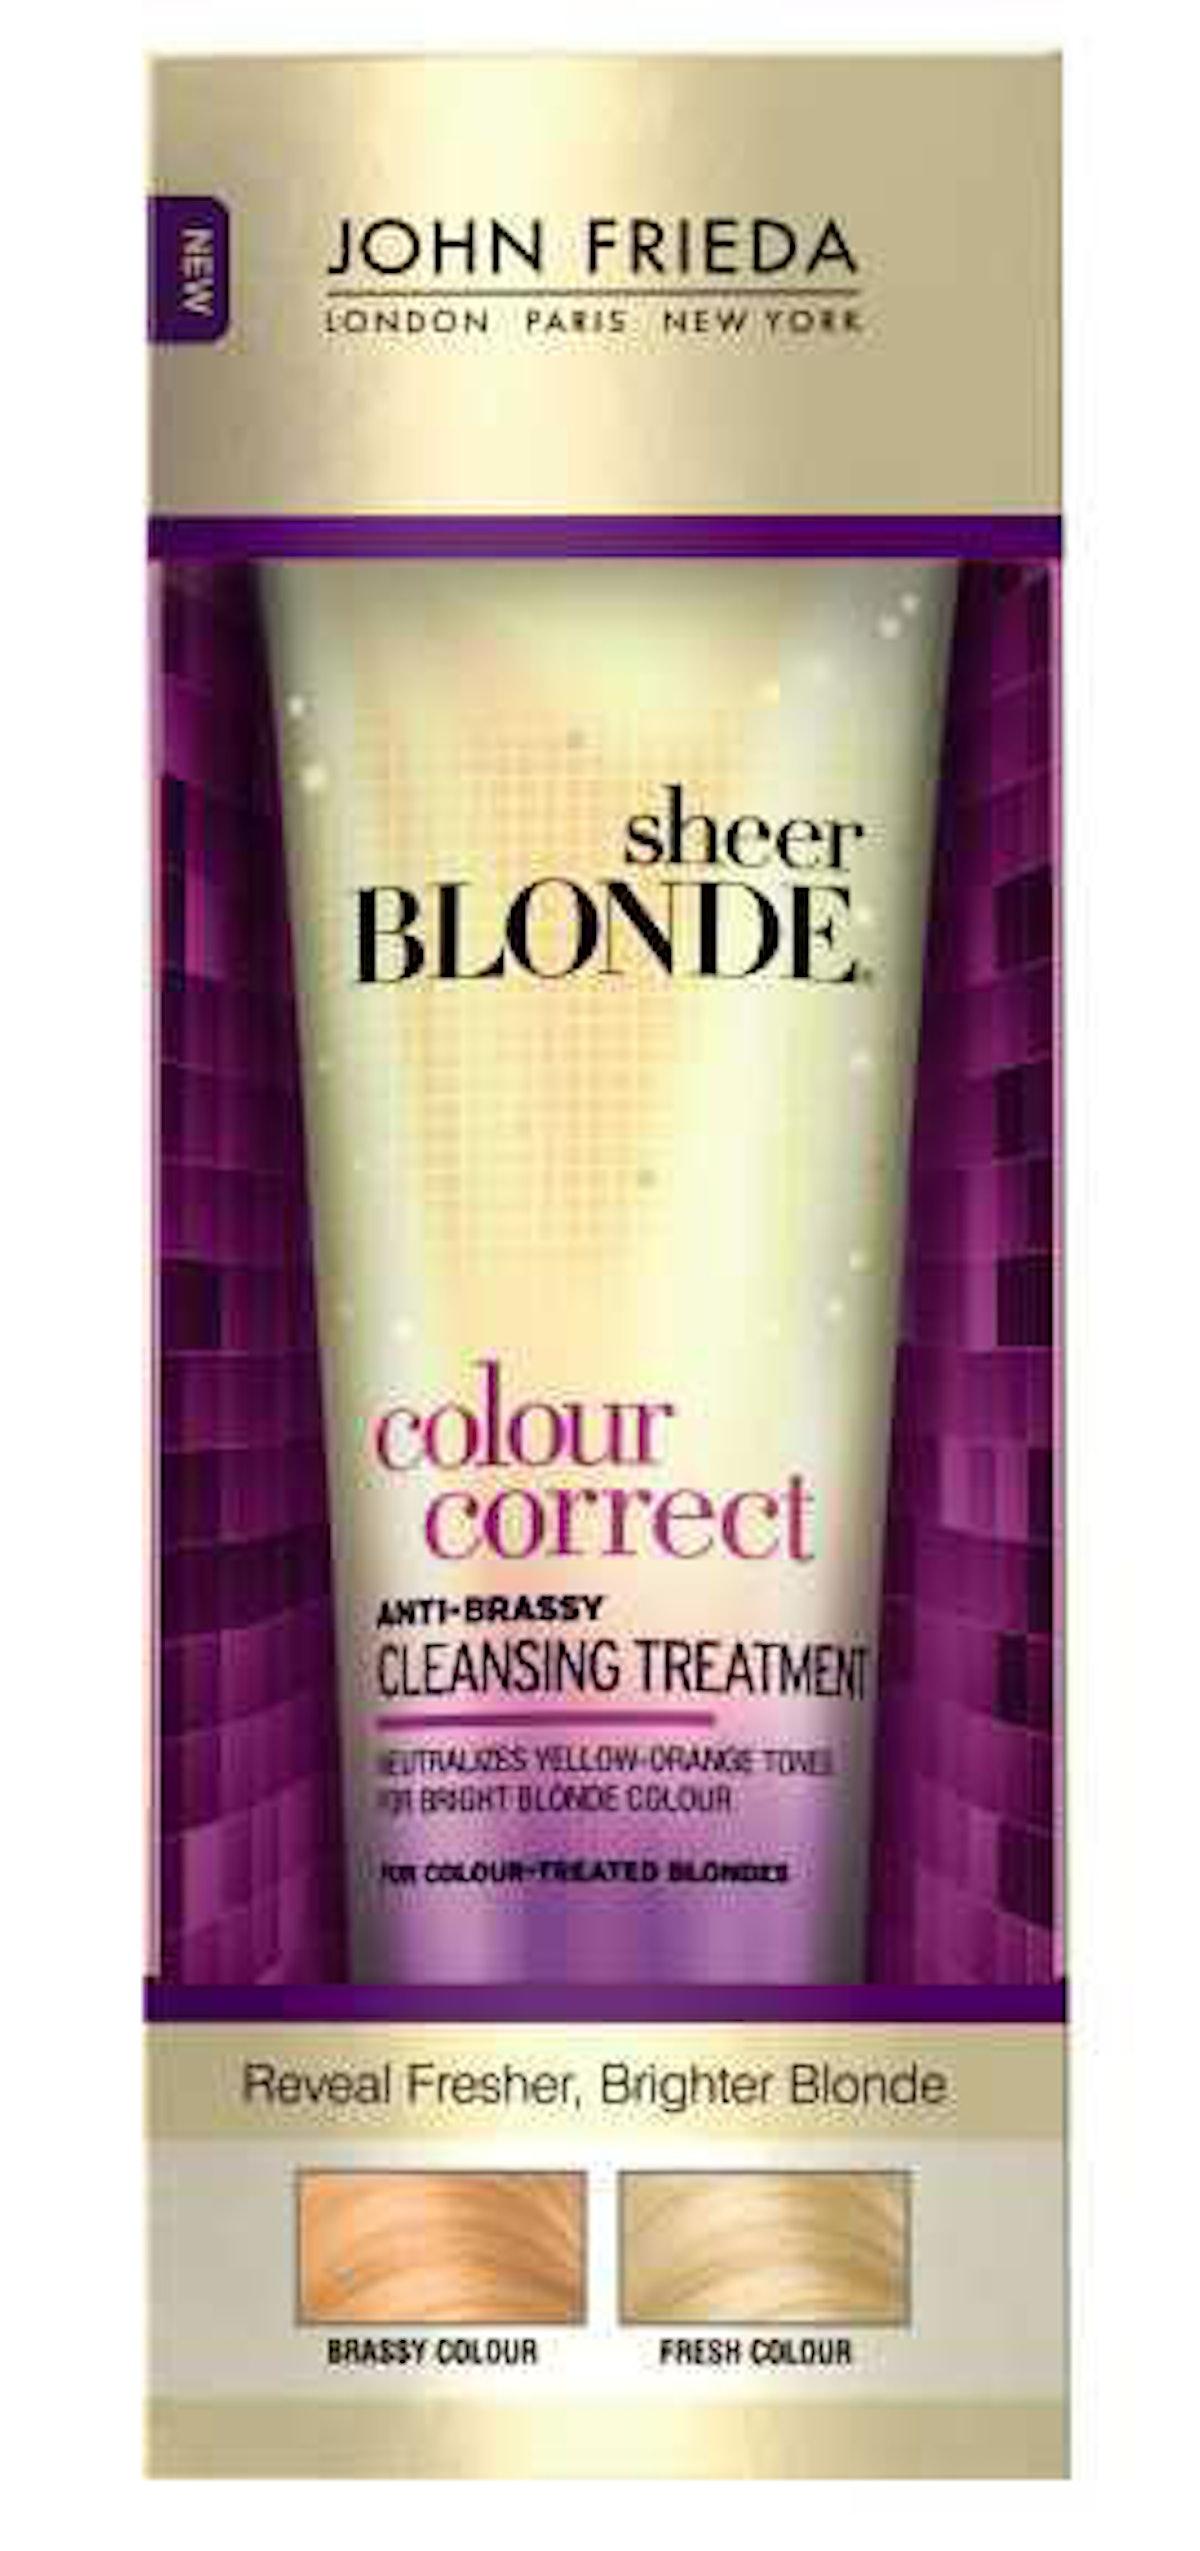 *John Frieda Sheer Blonde Colour Correct Anti-Brassy Cleansing Treatment, $9,* *[johnfrieda.com](http://www.johnfrieda.com/en-US/ProductDetail/Hair-Care/Sheer-Blonde/Sheer-Blonde-Colour-Correct-Treatment).*